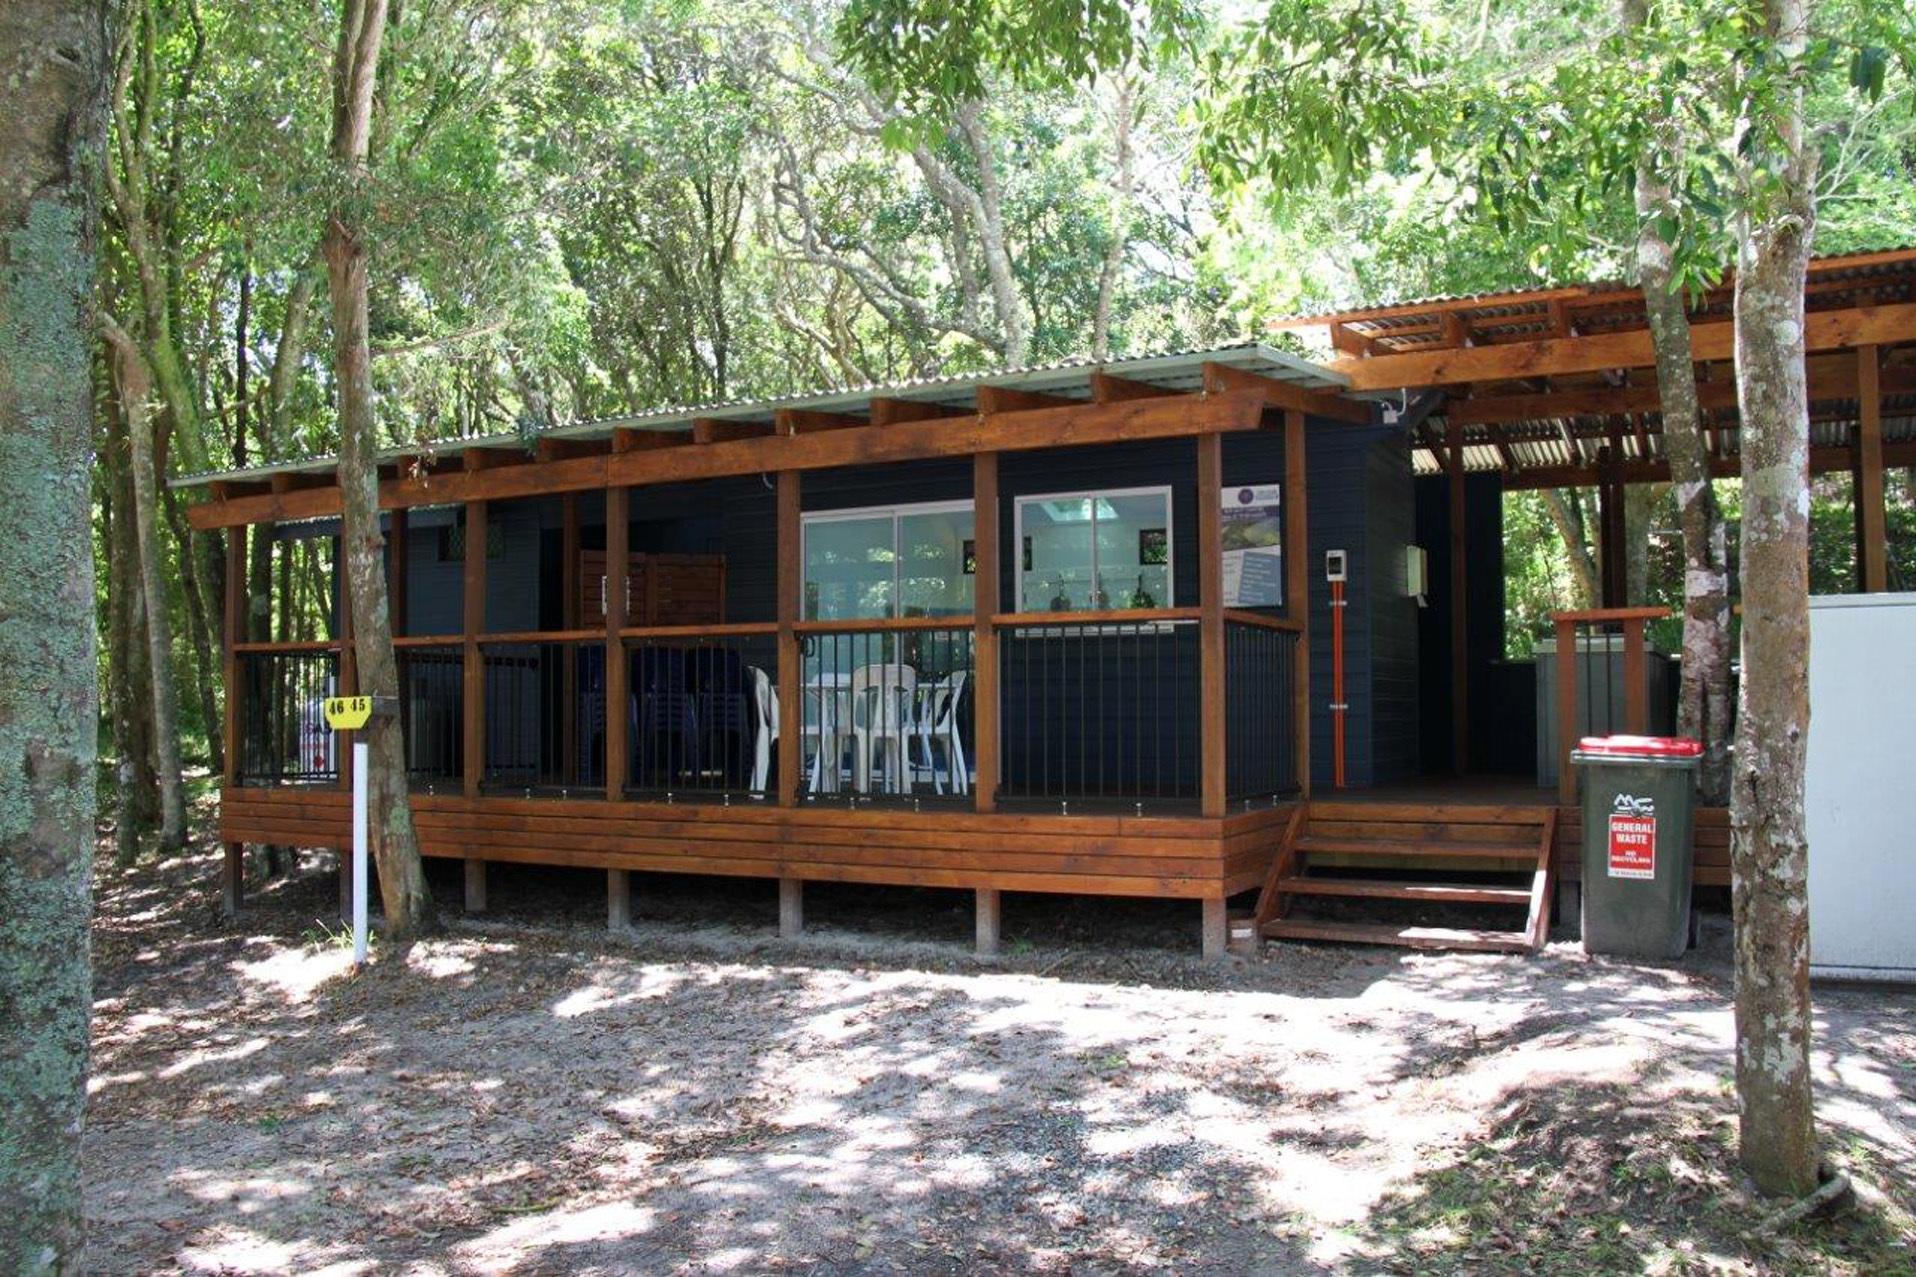 q - Tiona Palms Caravan Park